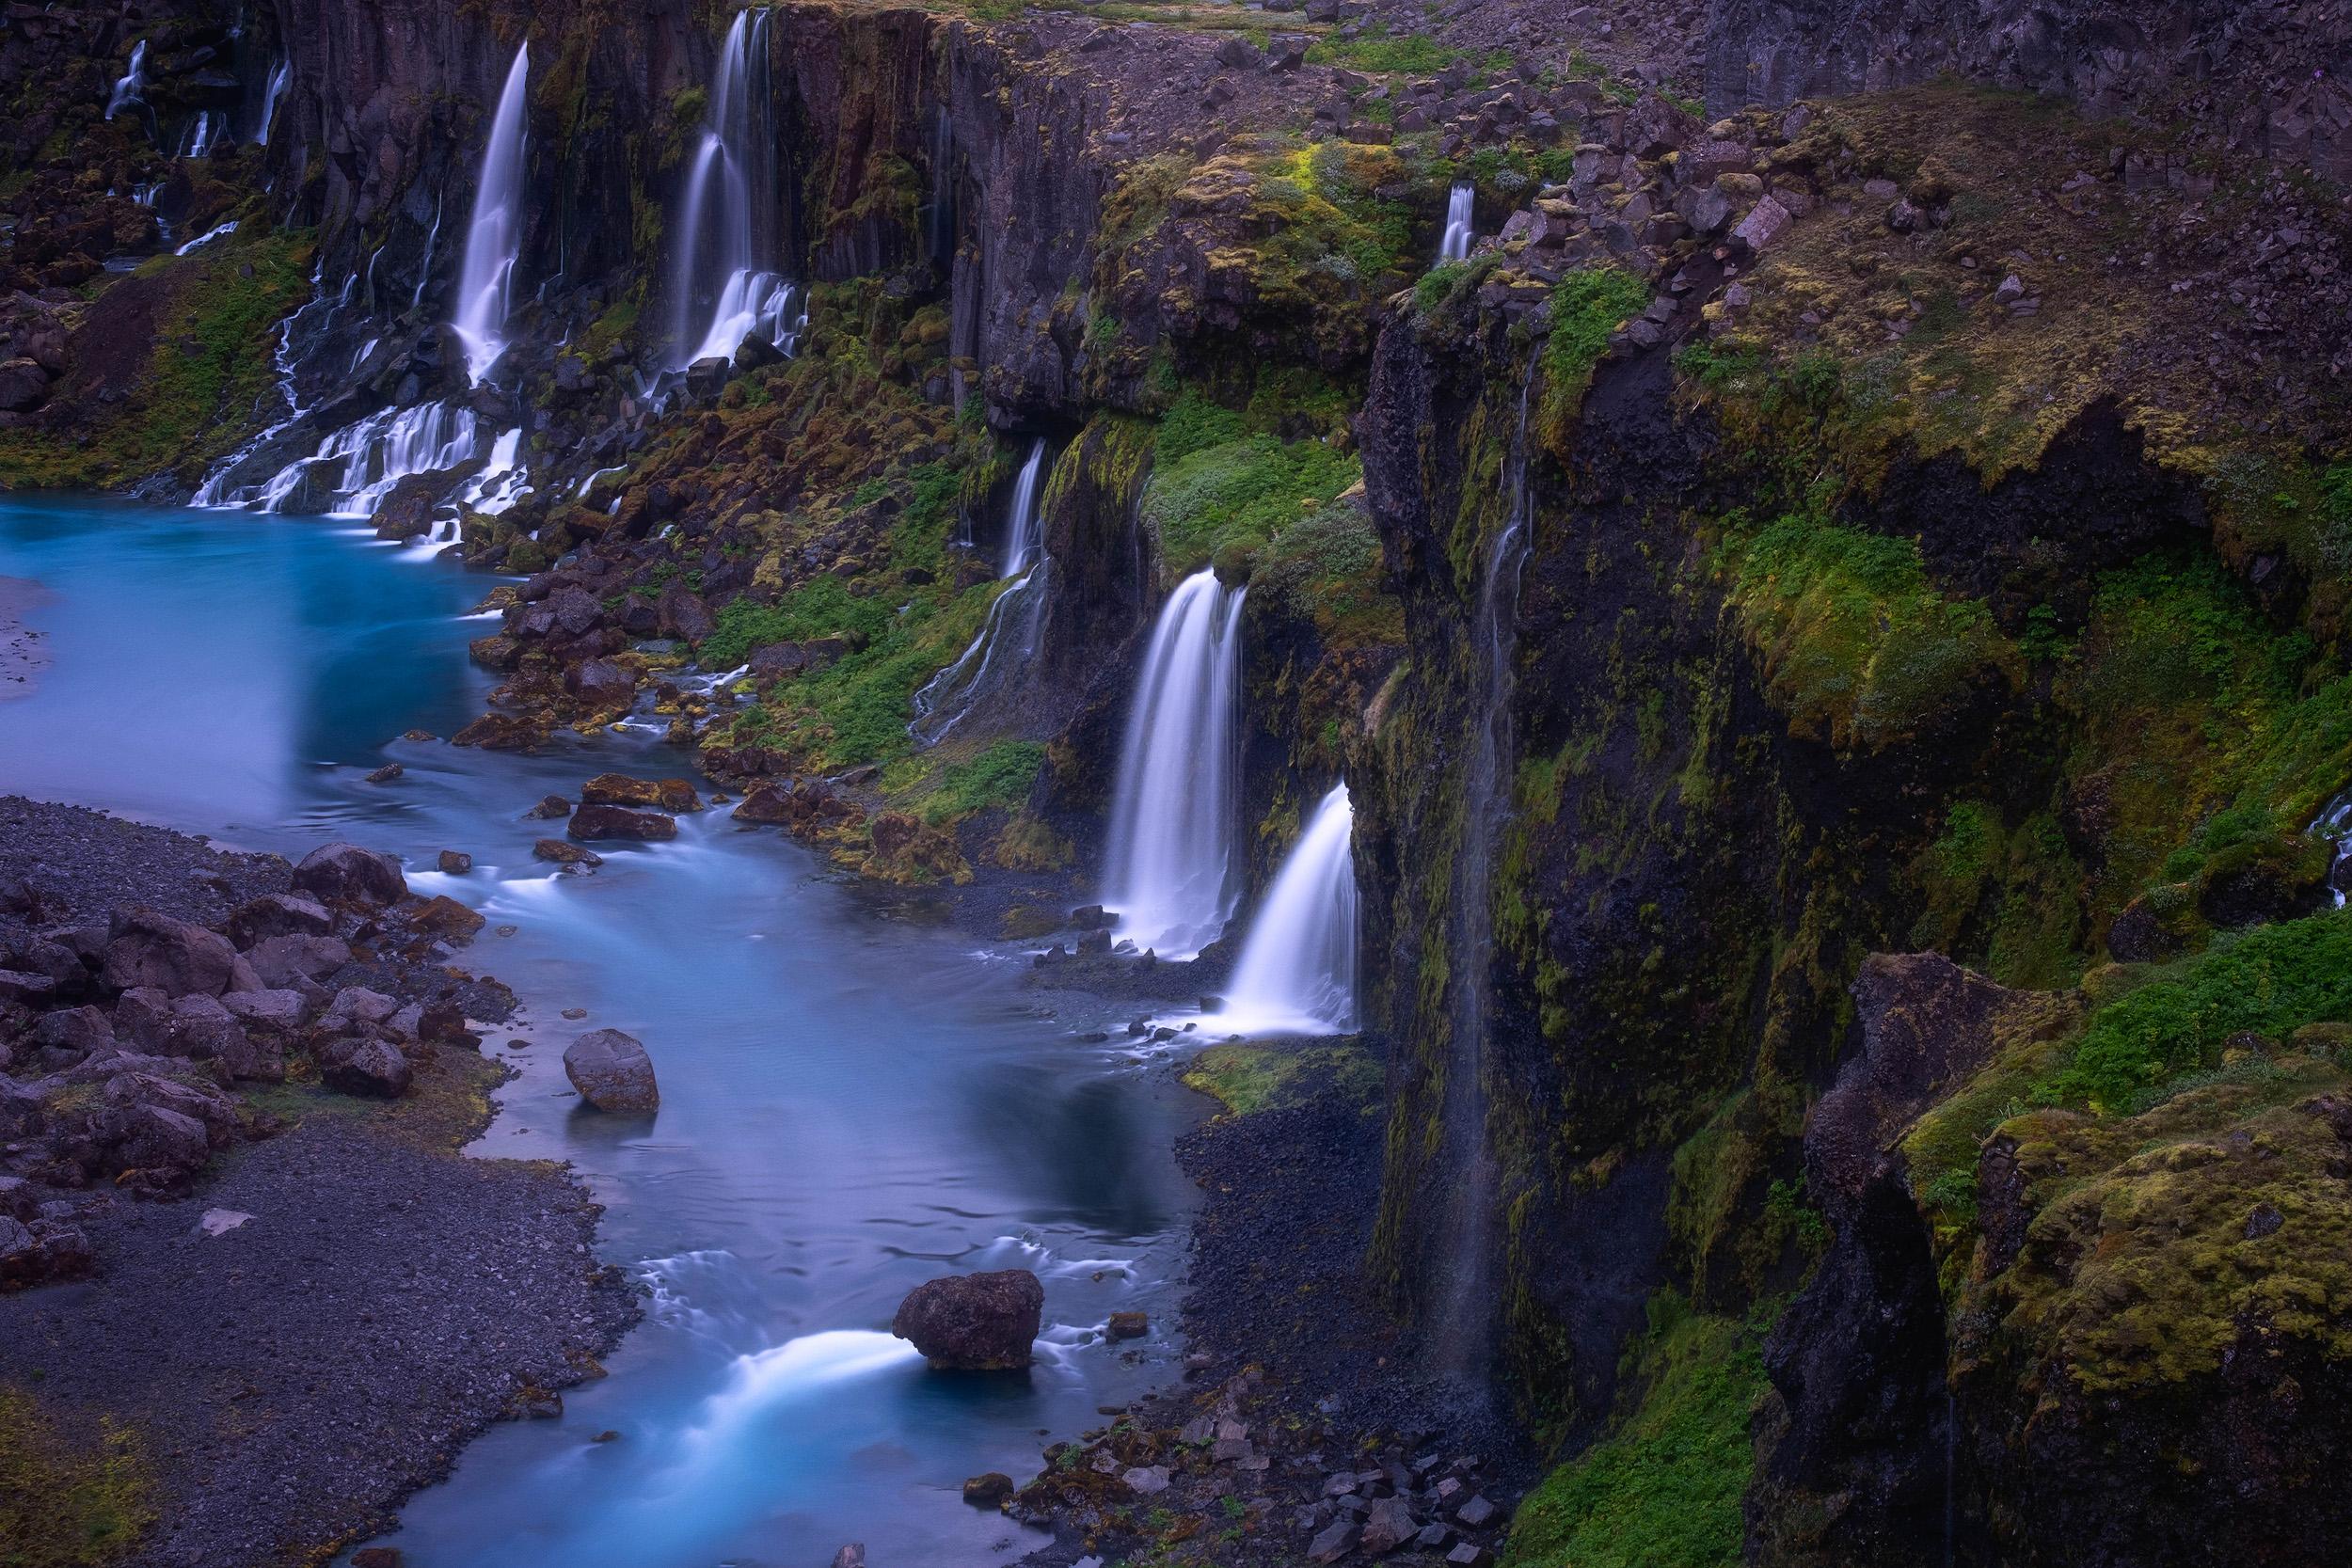 Highlands waterfall2.jpg